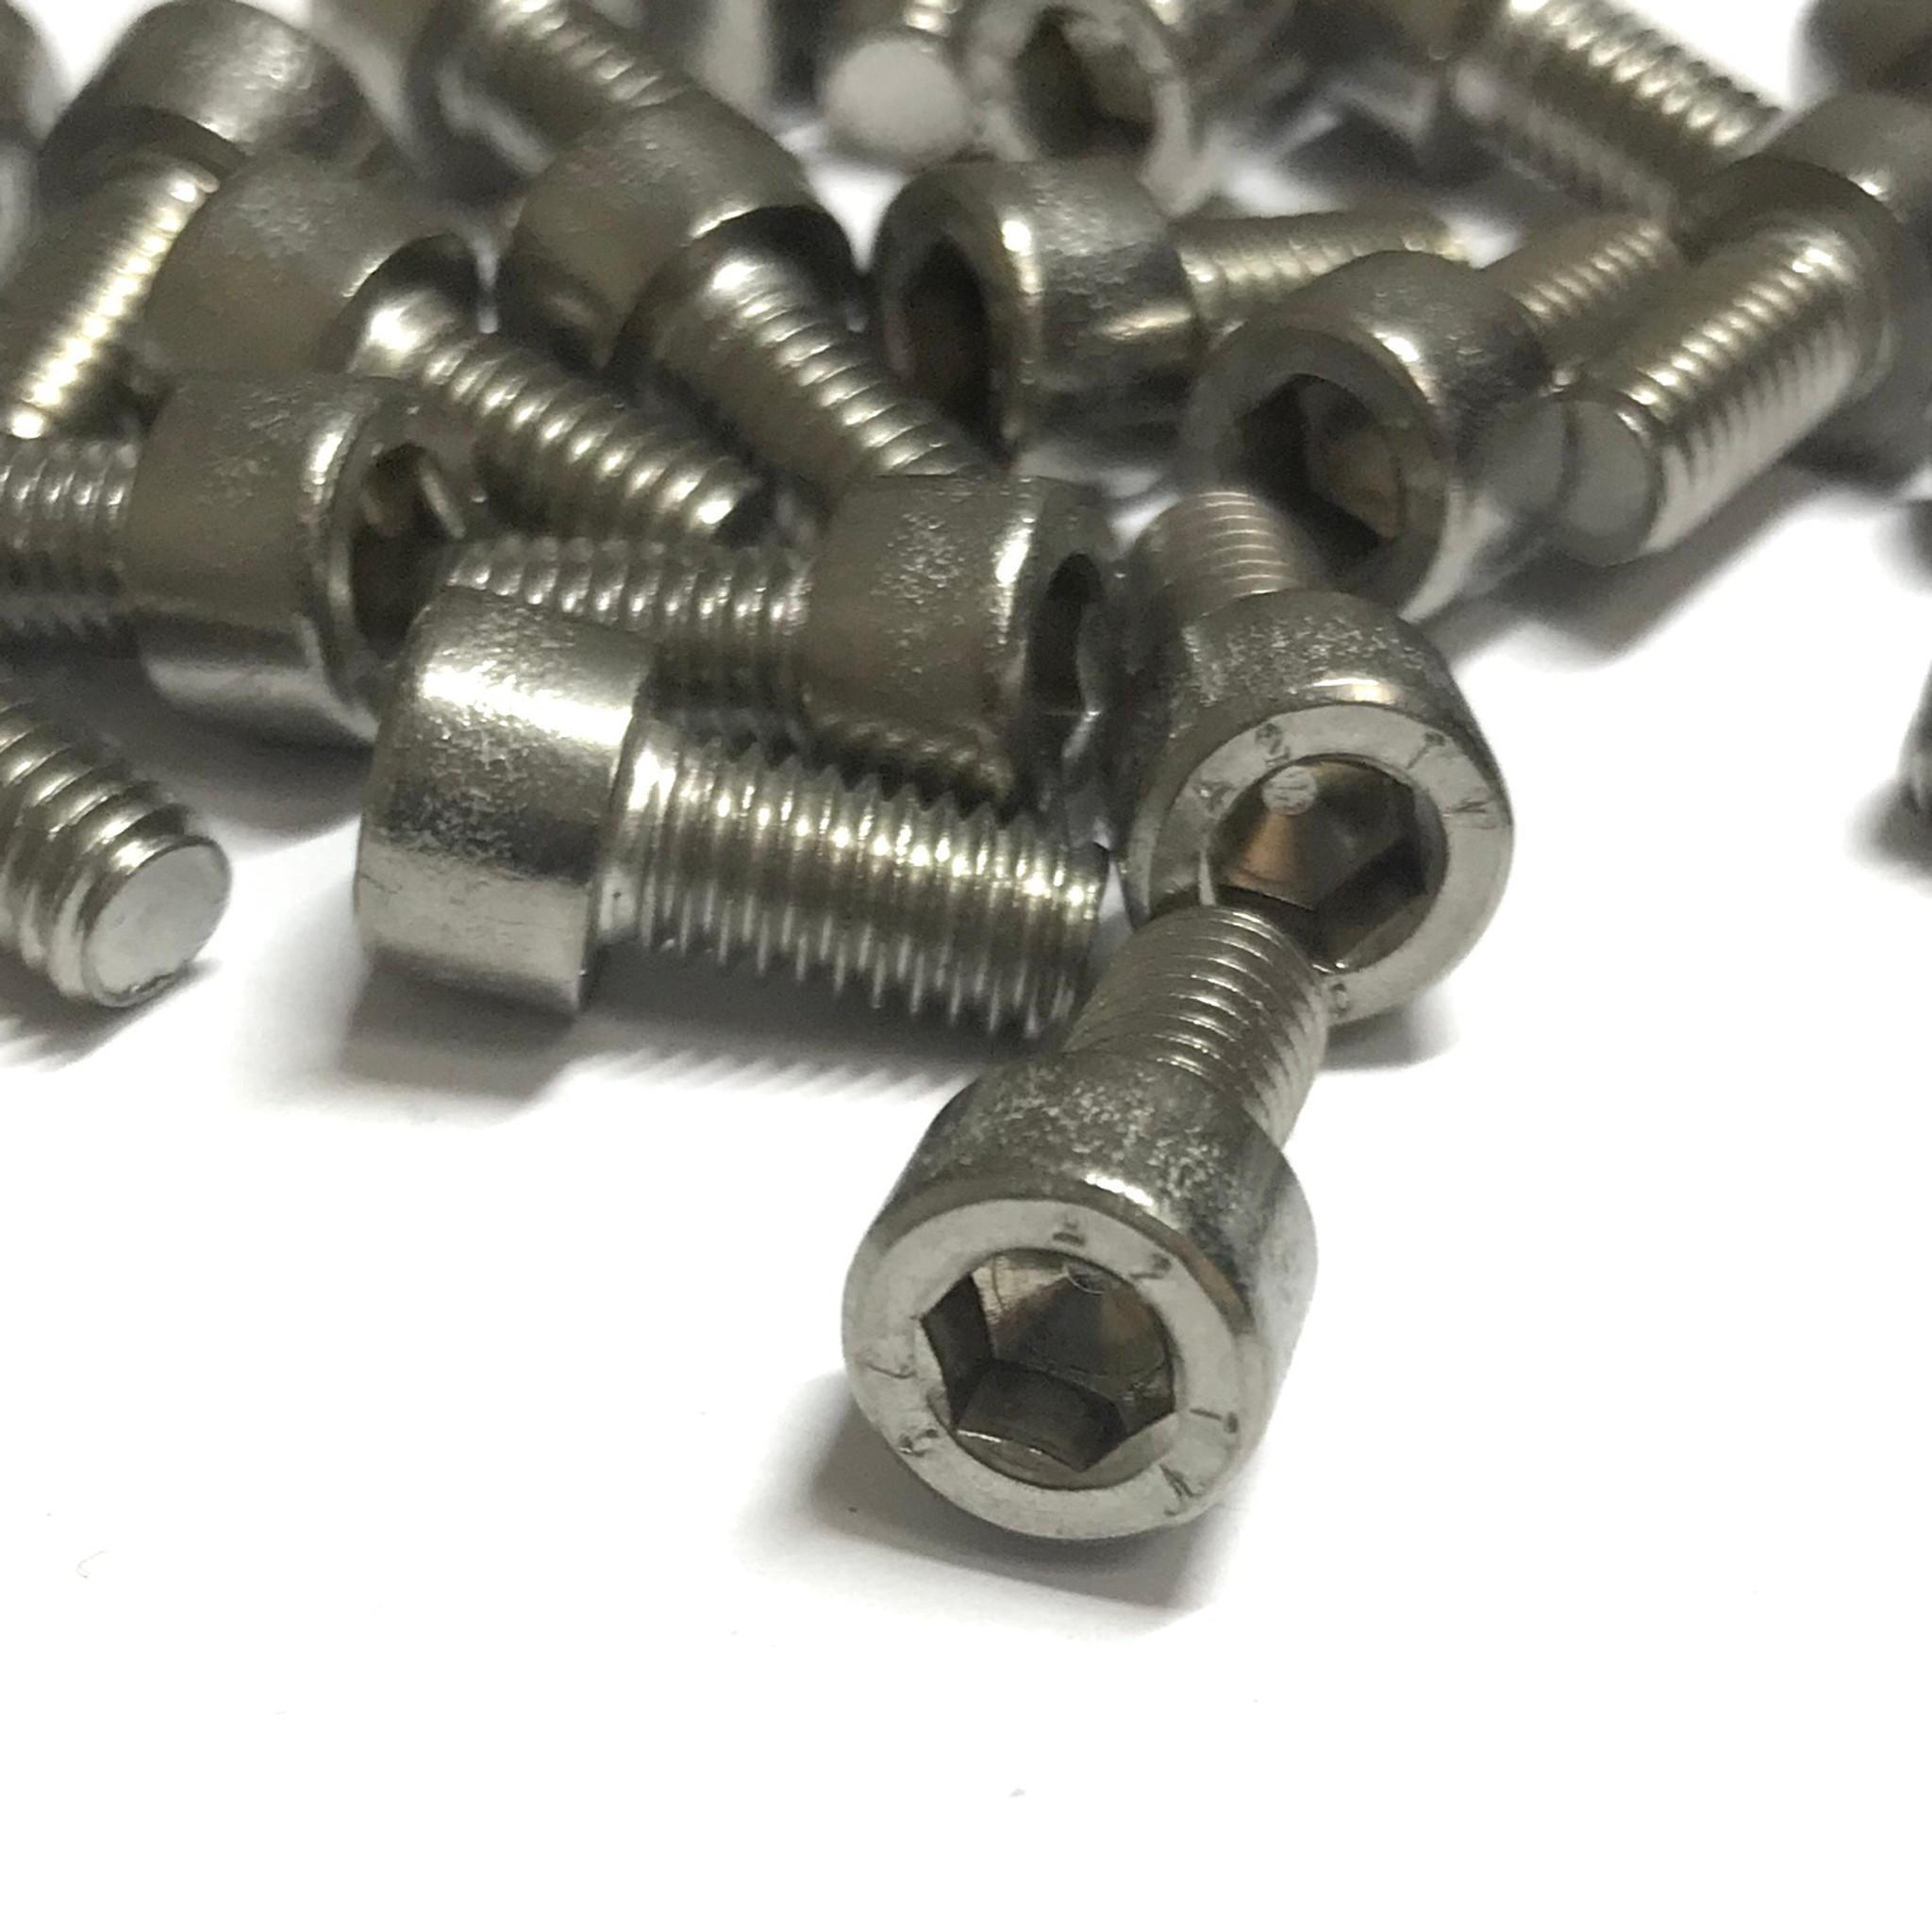 M6-1.0 x 12mm Stainless Steel Socket Head Caps Screws Metric DIN 912 A2 Coarse